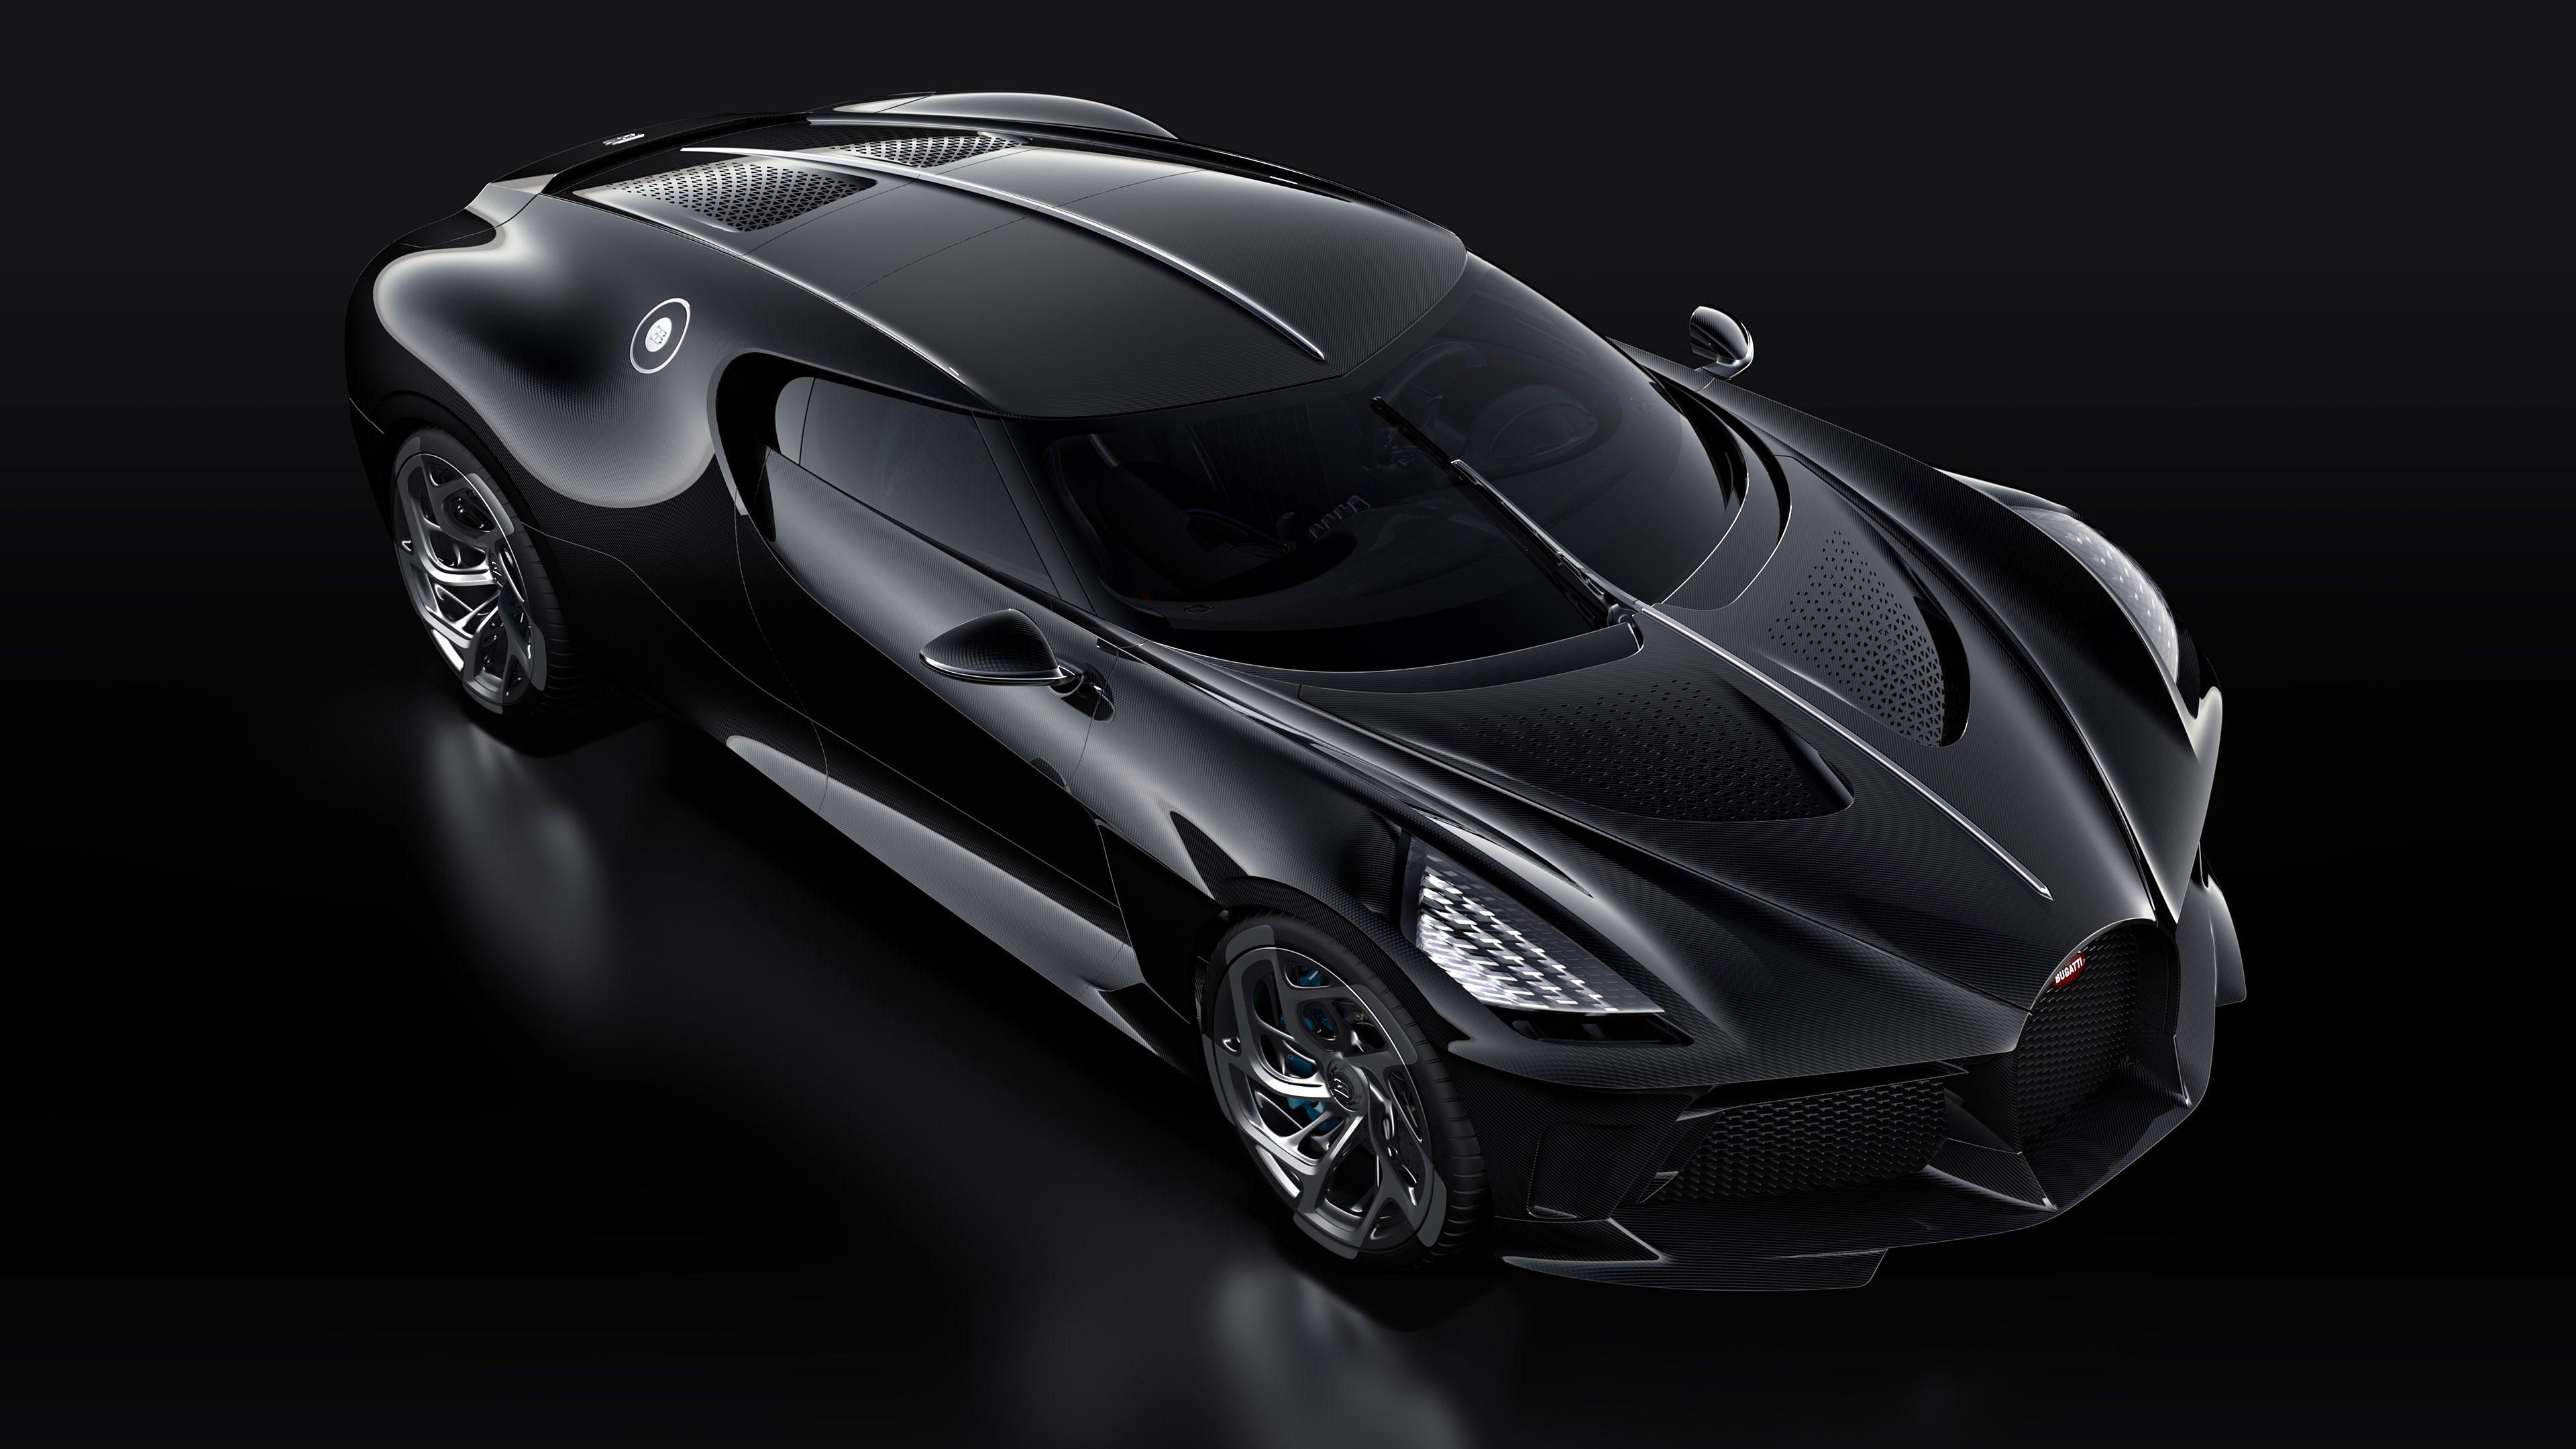 Download 2019 Bugatti La Voiture Noire Luxury Car: Bugatti La Voiture Noire 2019 4k Bugatti Wallpapers 4k